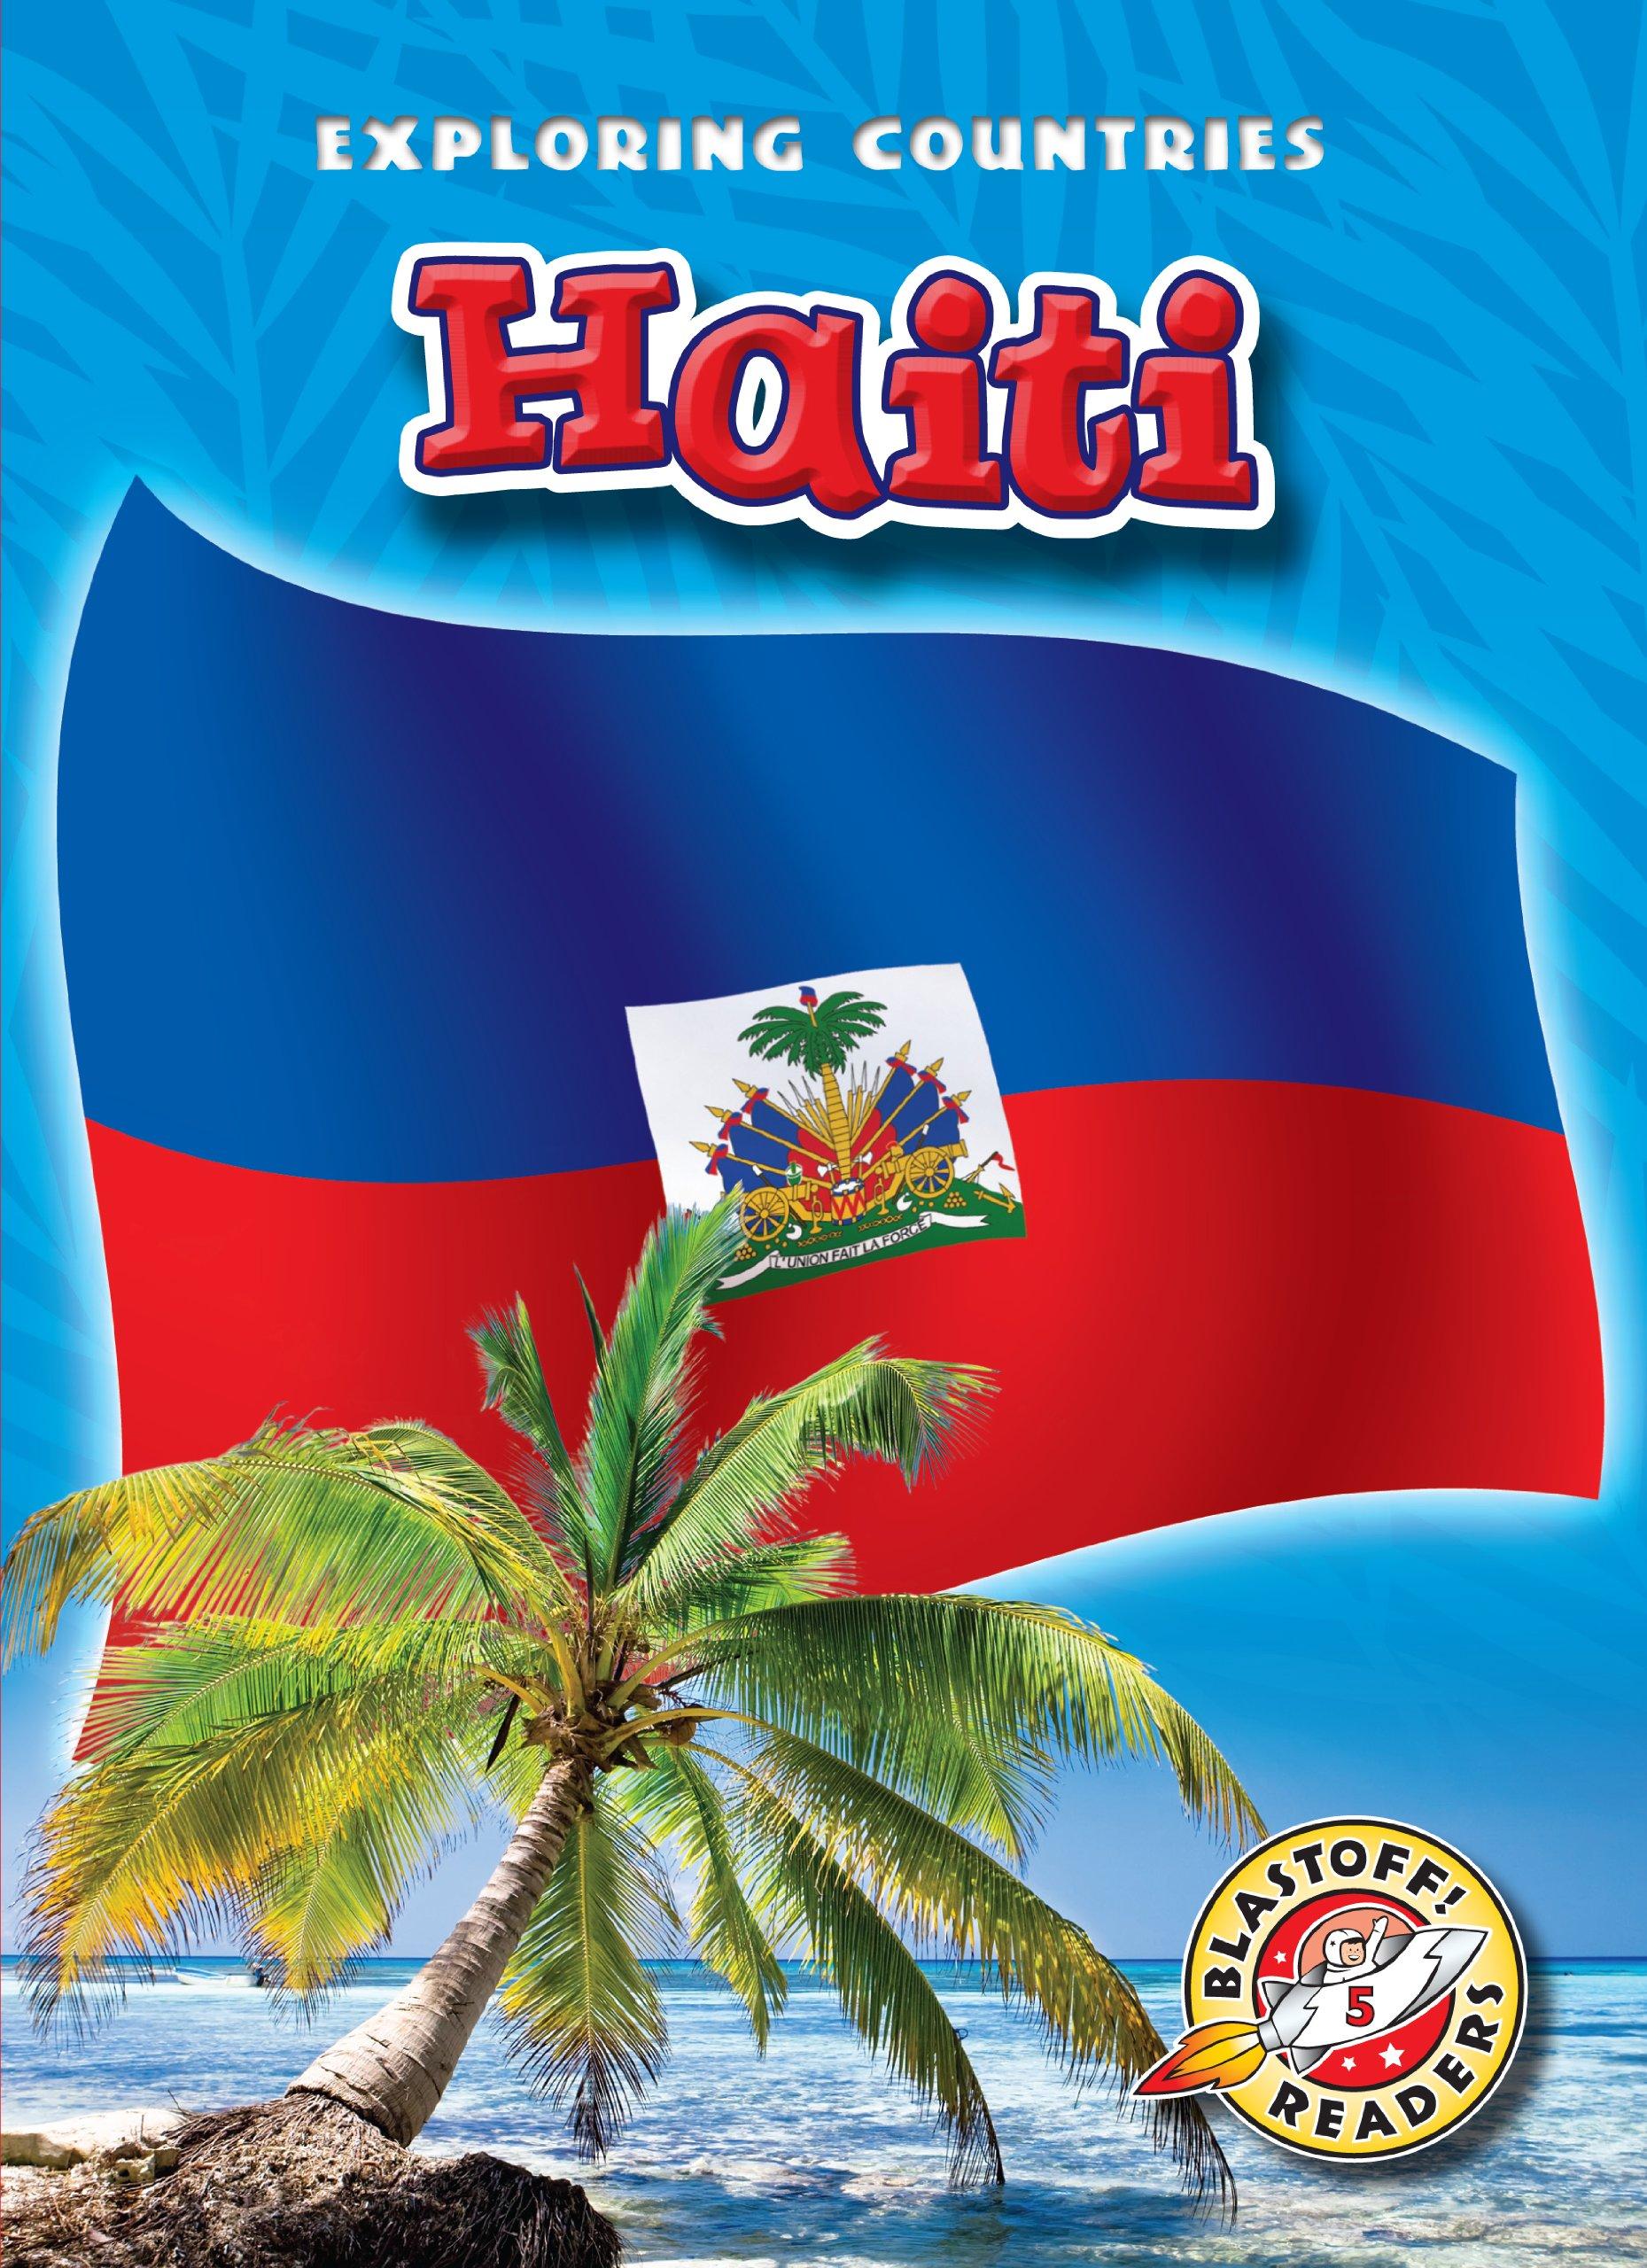 Haiti (Blastoff! Readers: Exploring Countries) (Blastoff Readers. Level 5) PDF